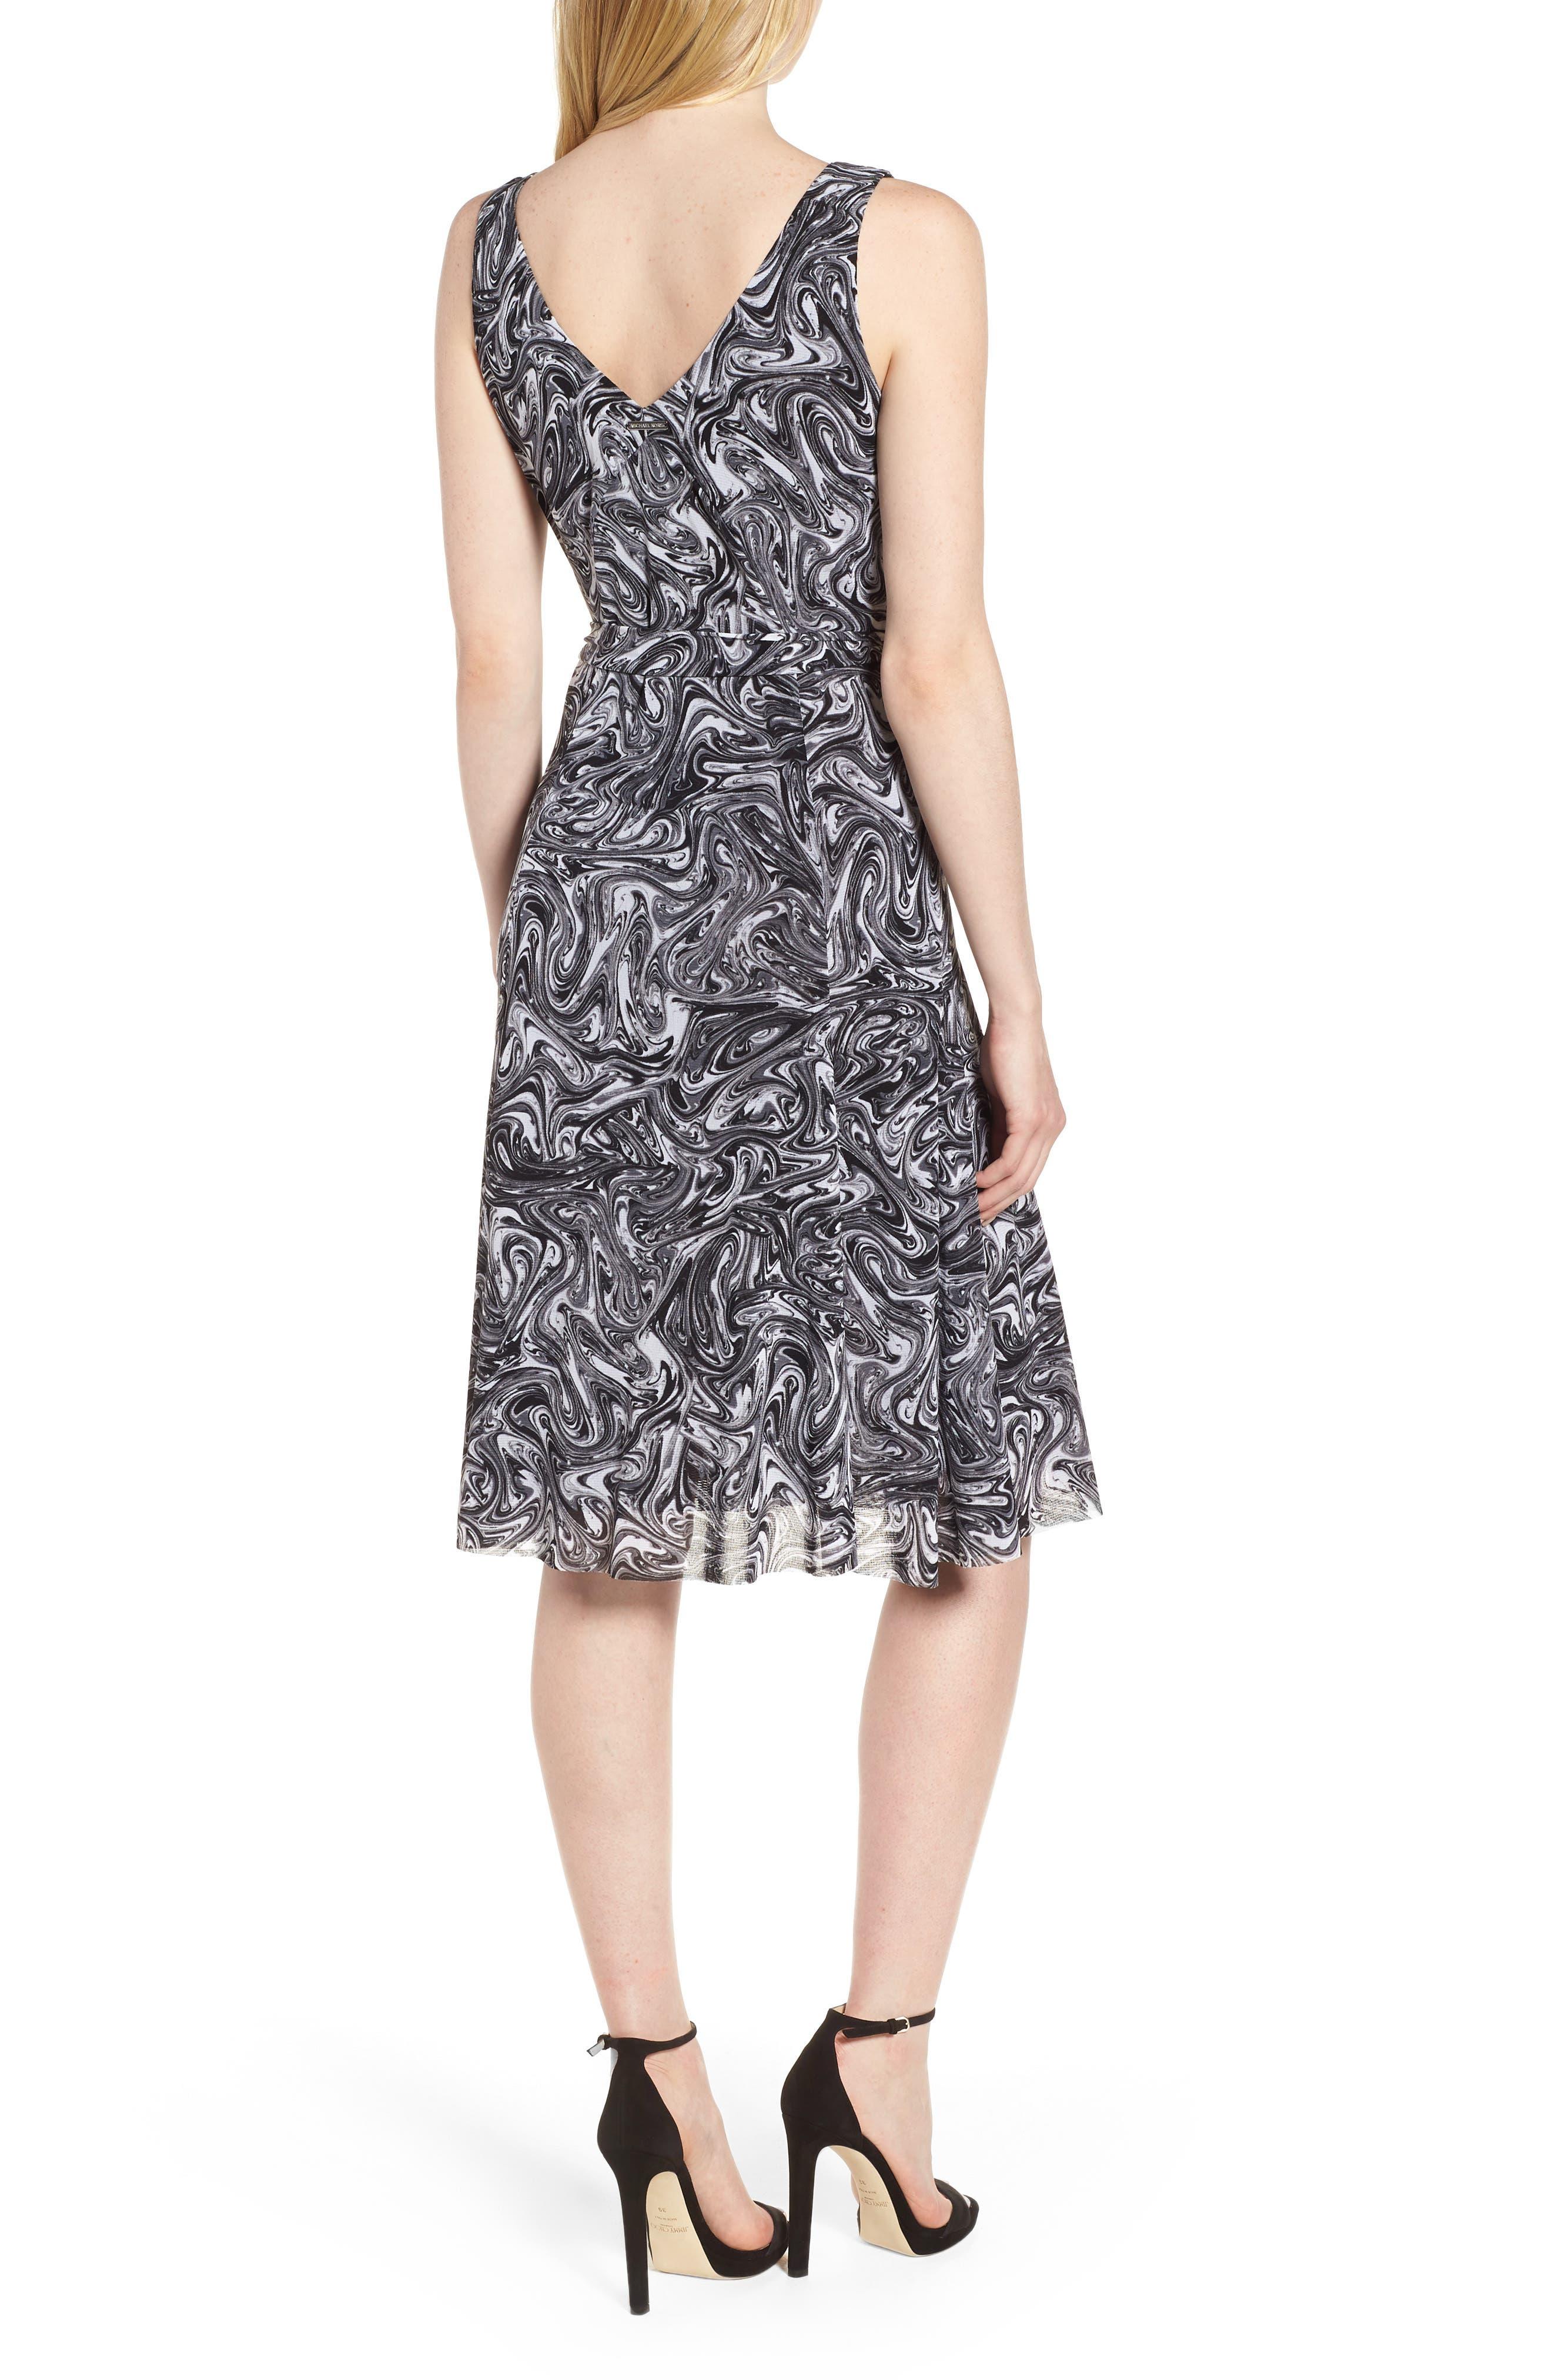 Watermark Swirl Flare Tank Dress,                             Alternate thumbnail 2, color,                             001